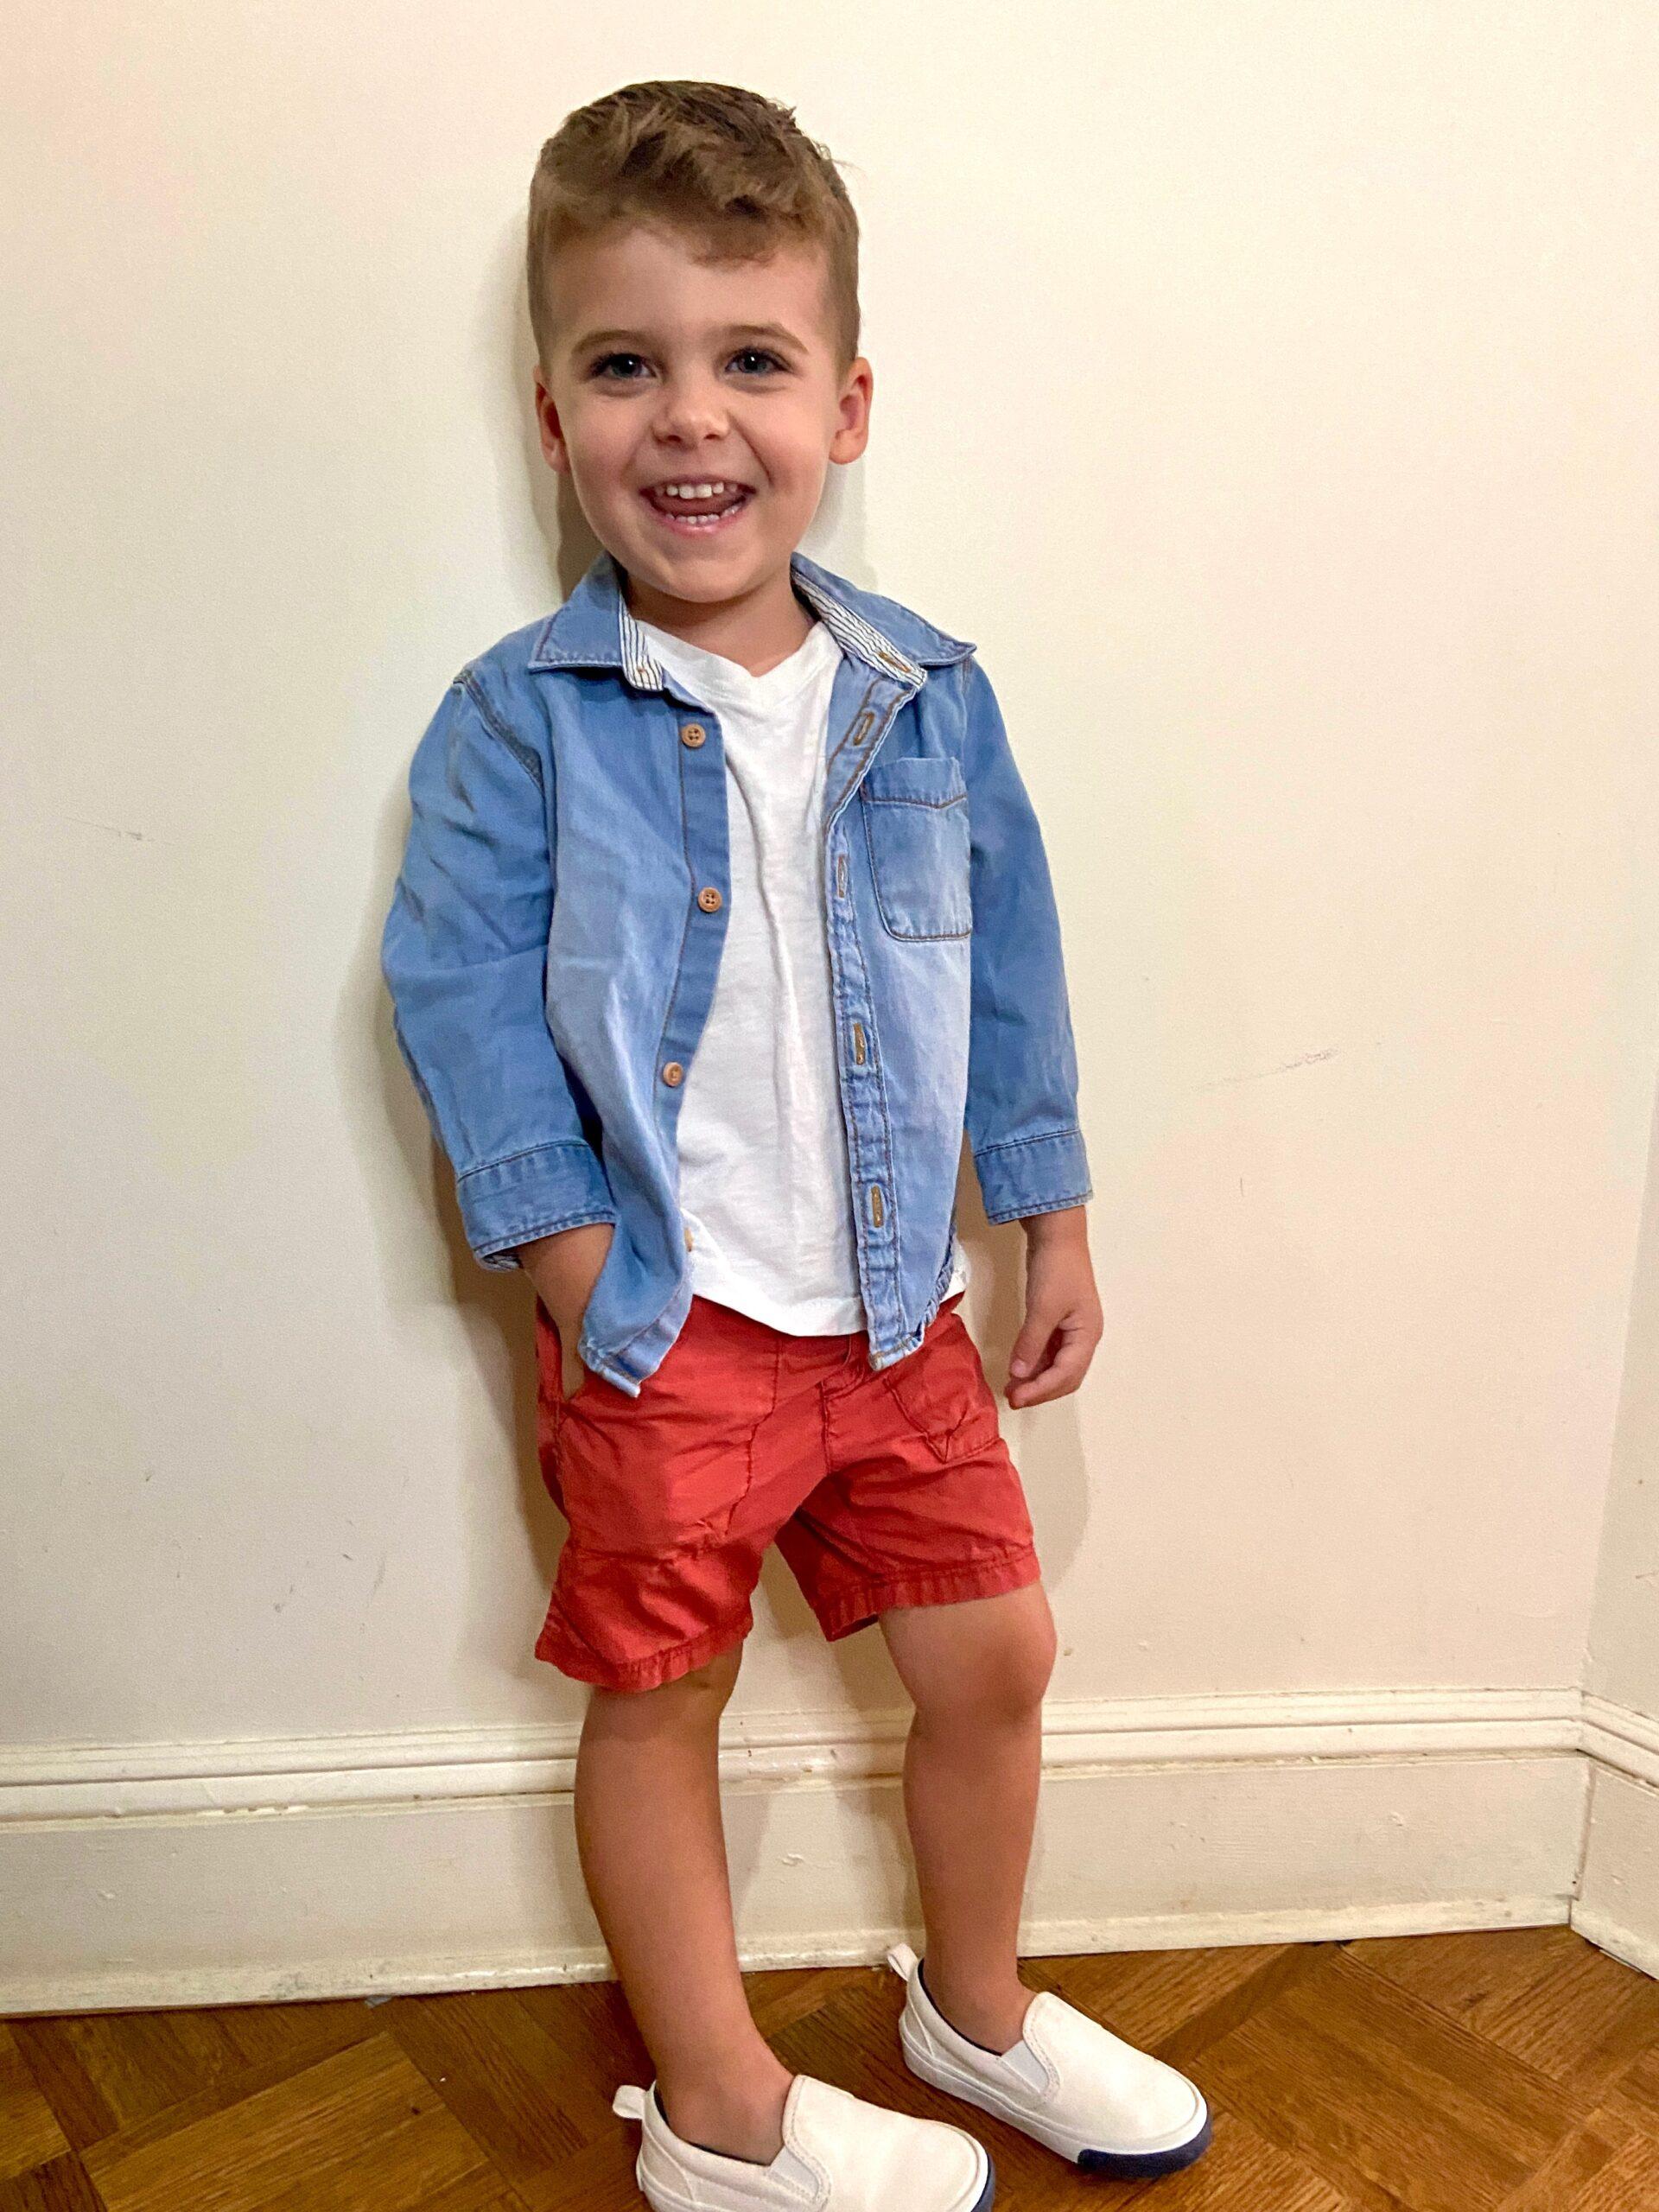 skyler hesington 3 years old